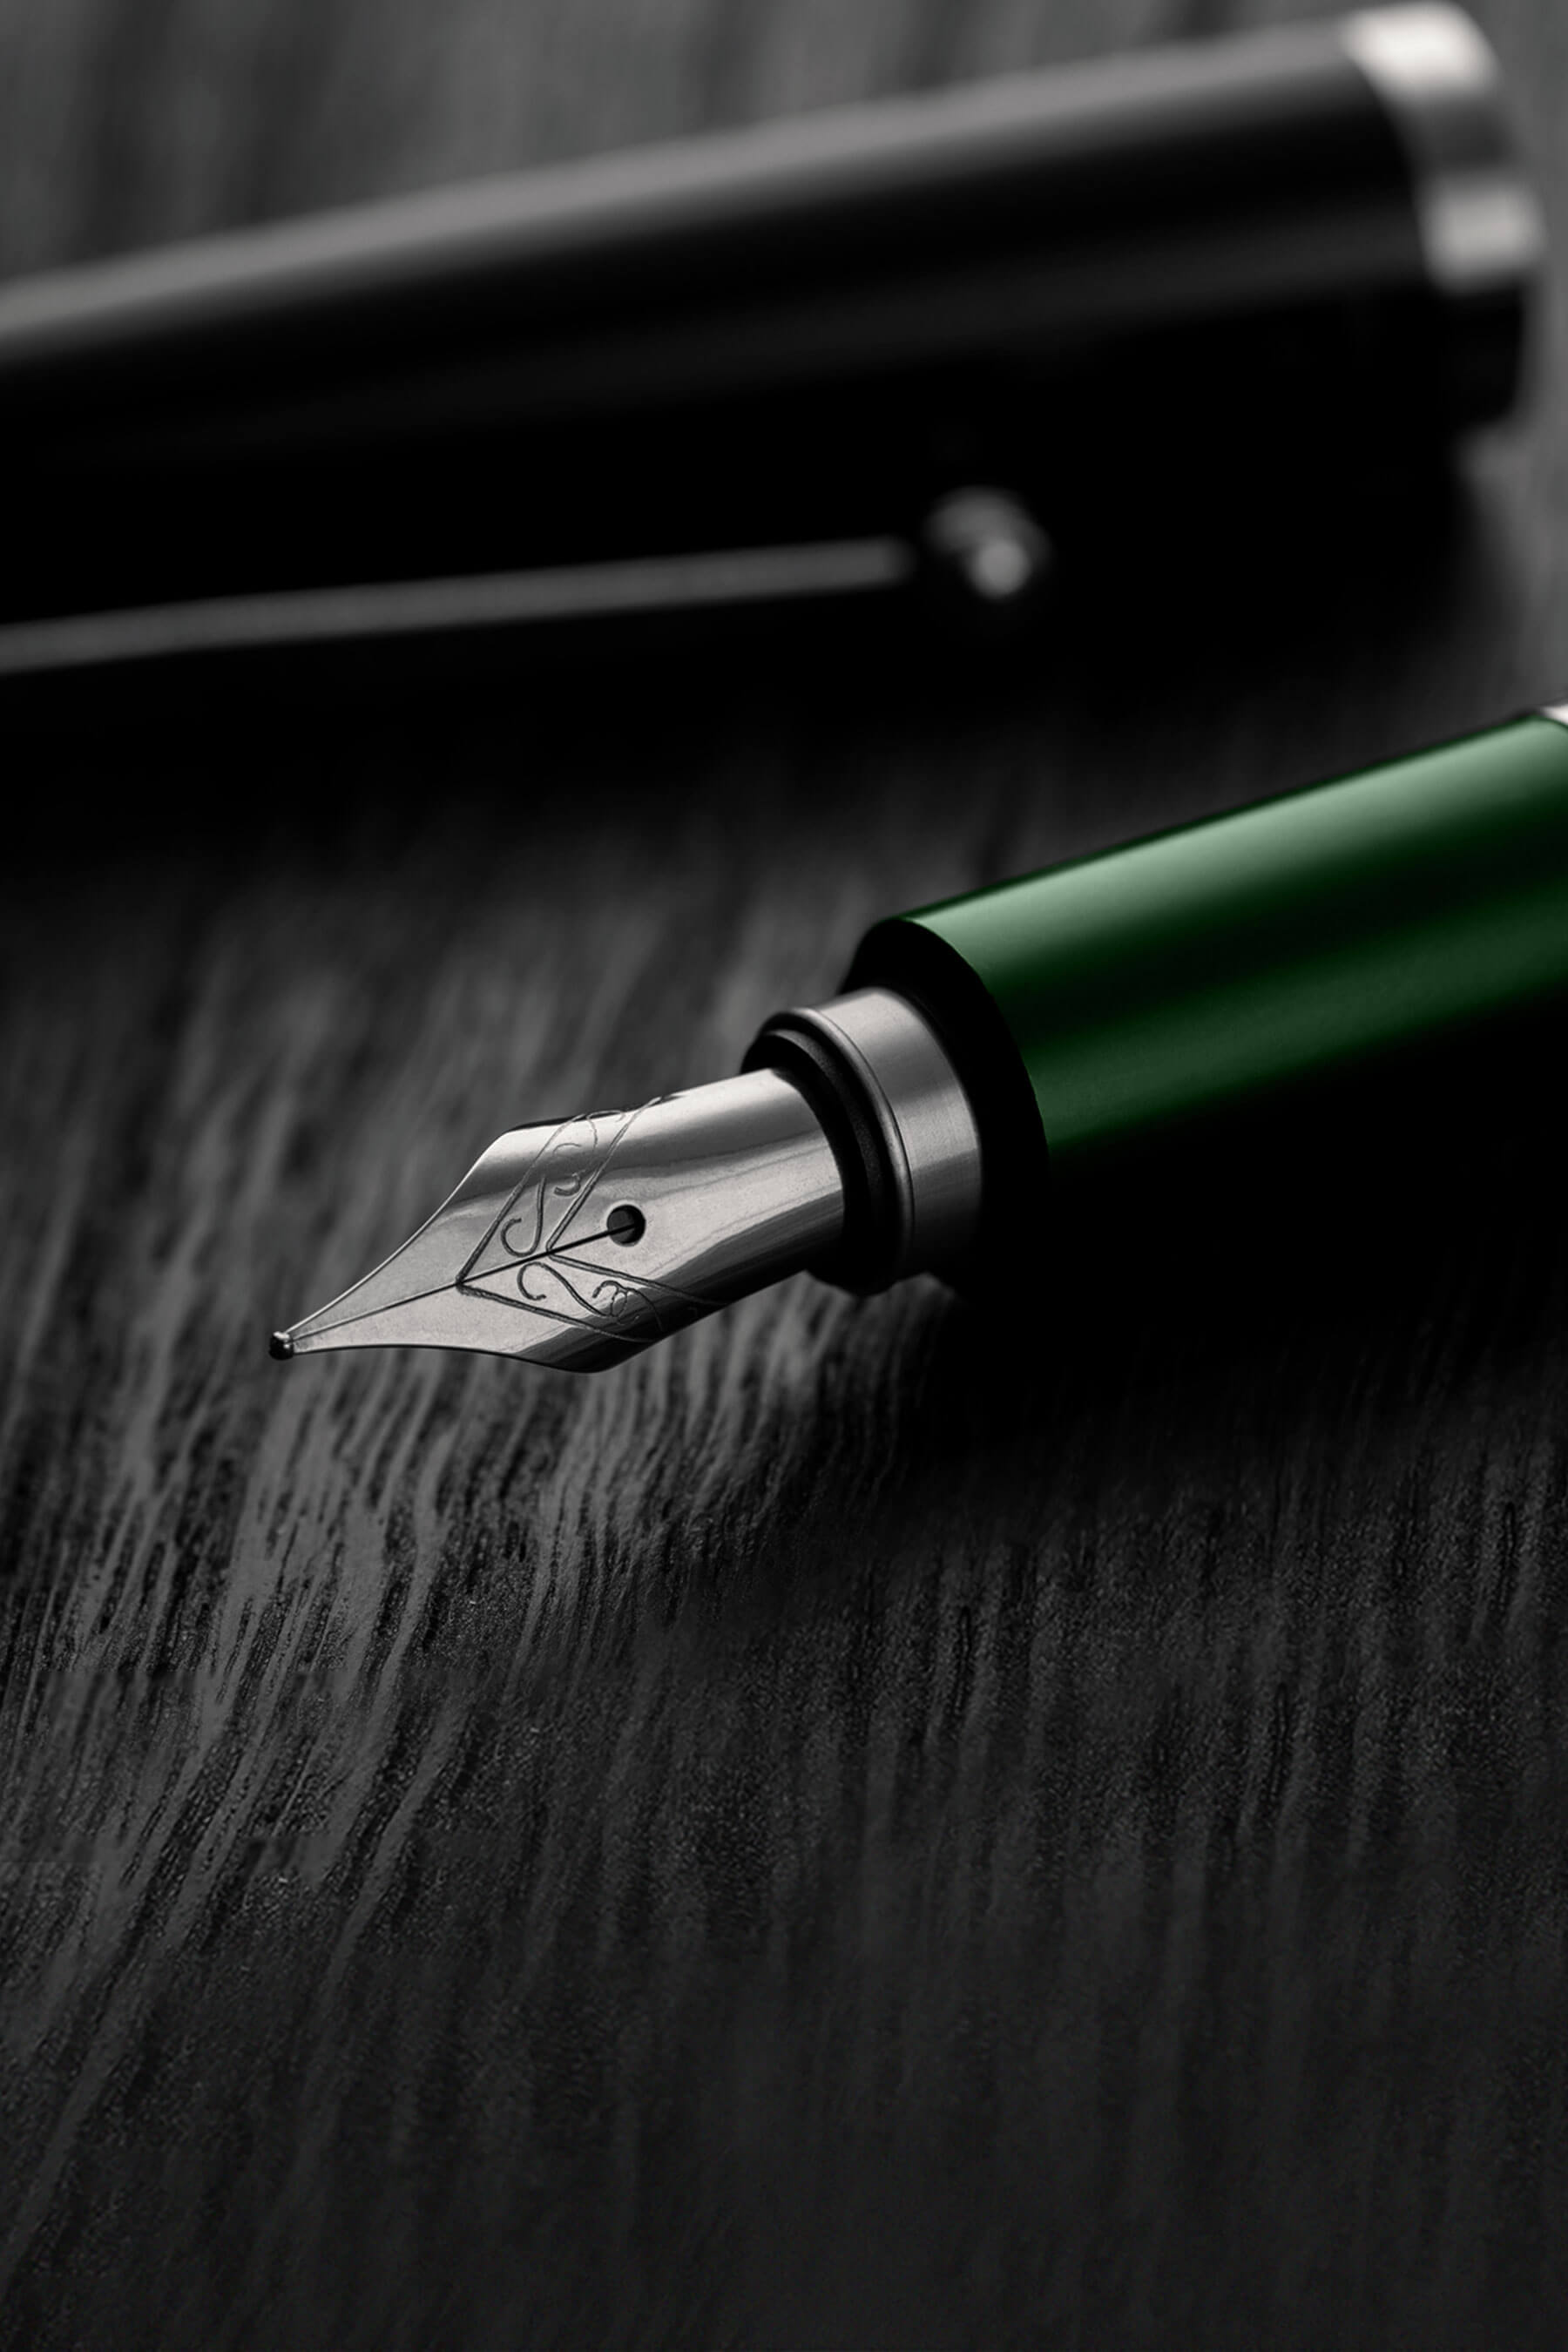 oaksmith gold international premium pen on table top